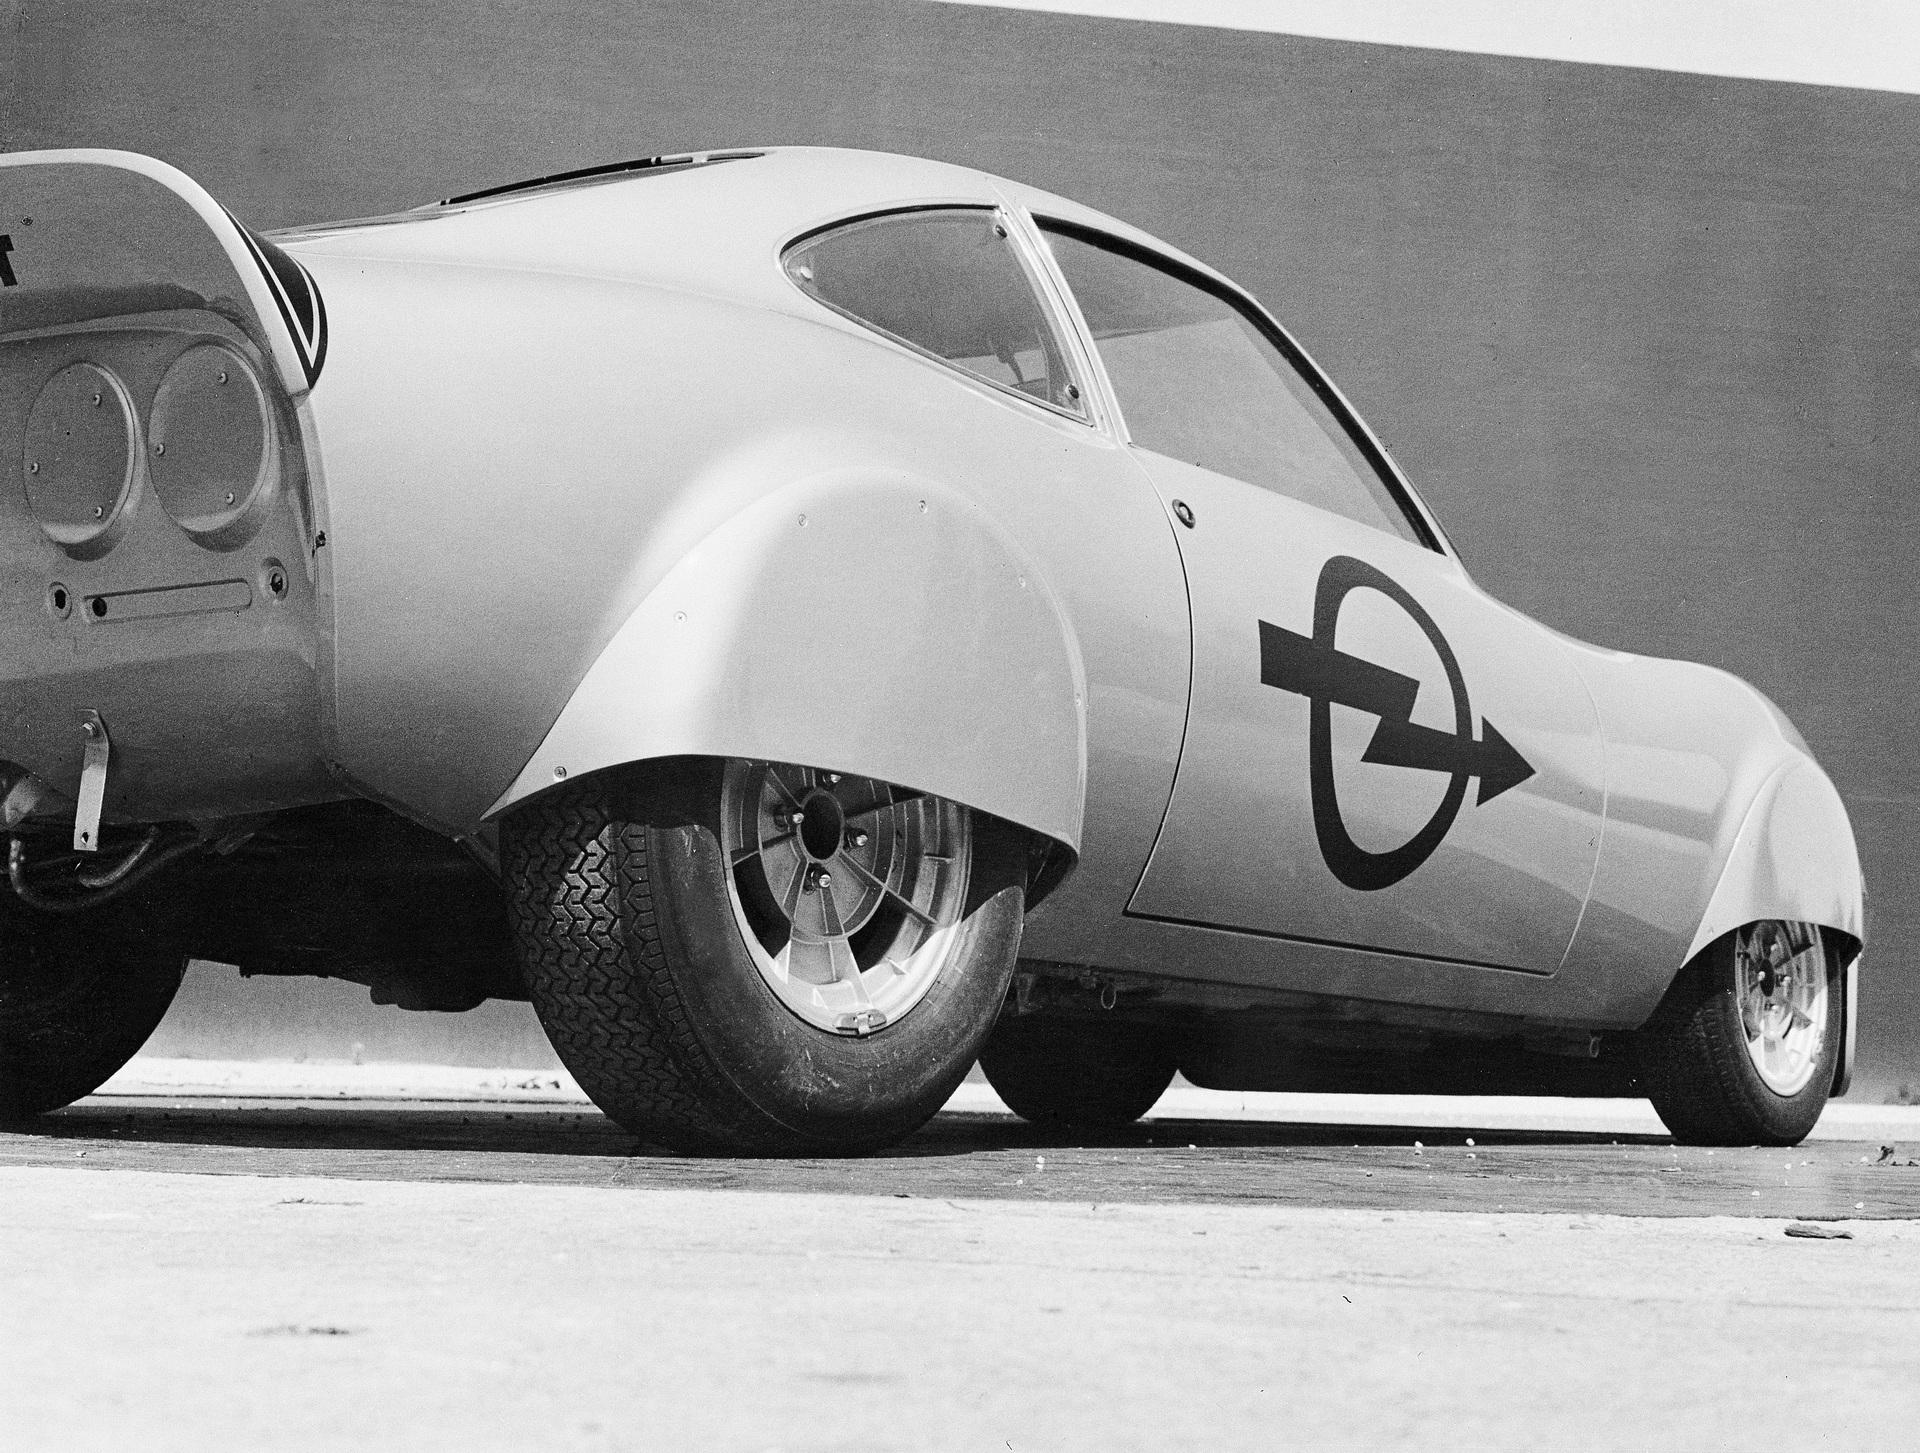 Opel slavi 50 godina od testiranja Elektro GT modela